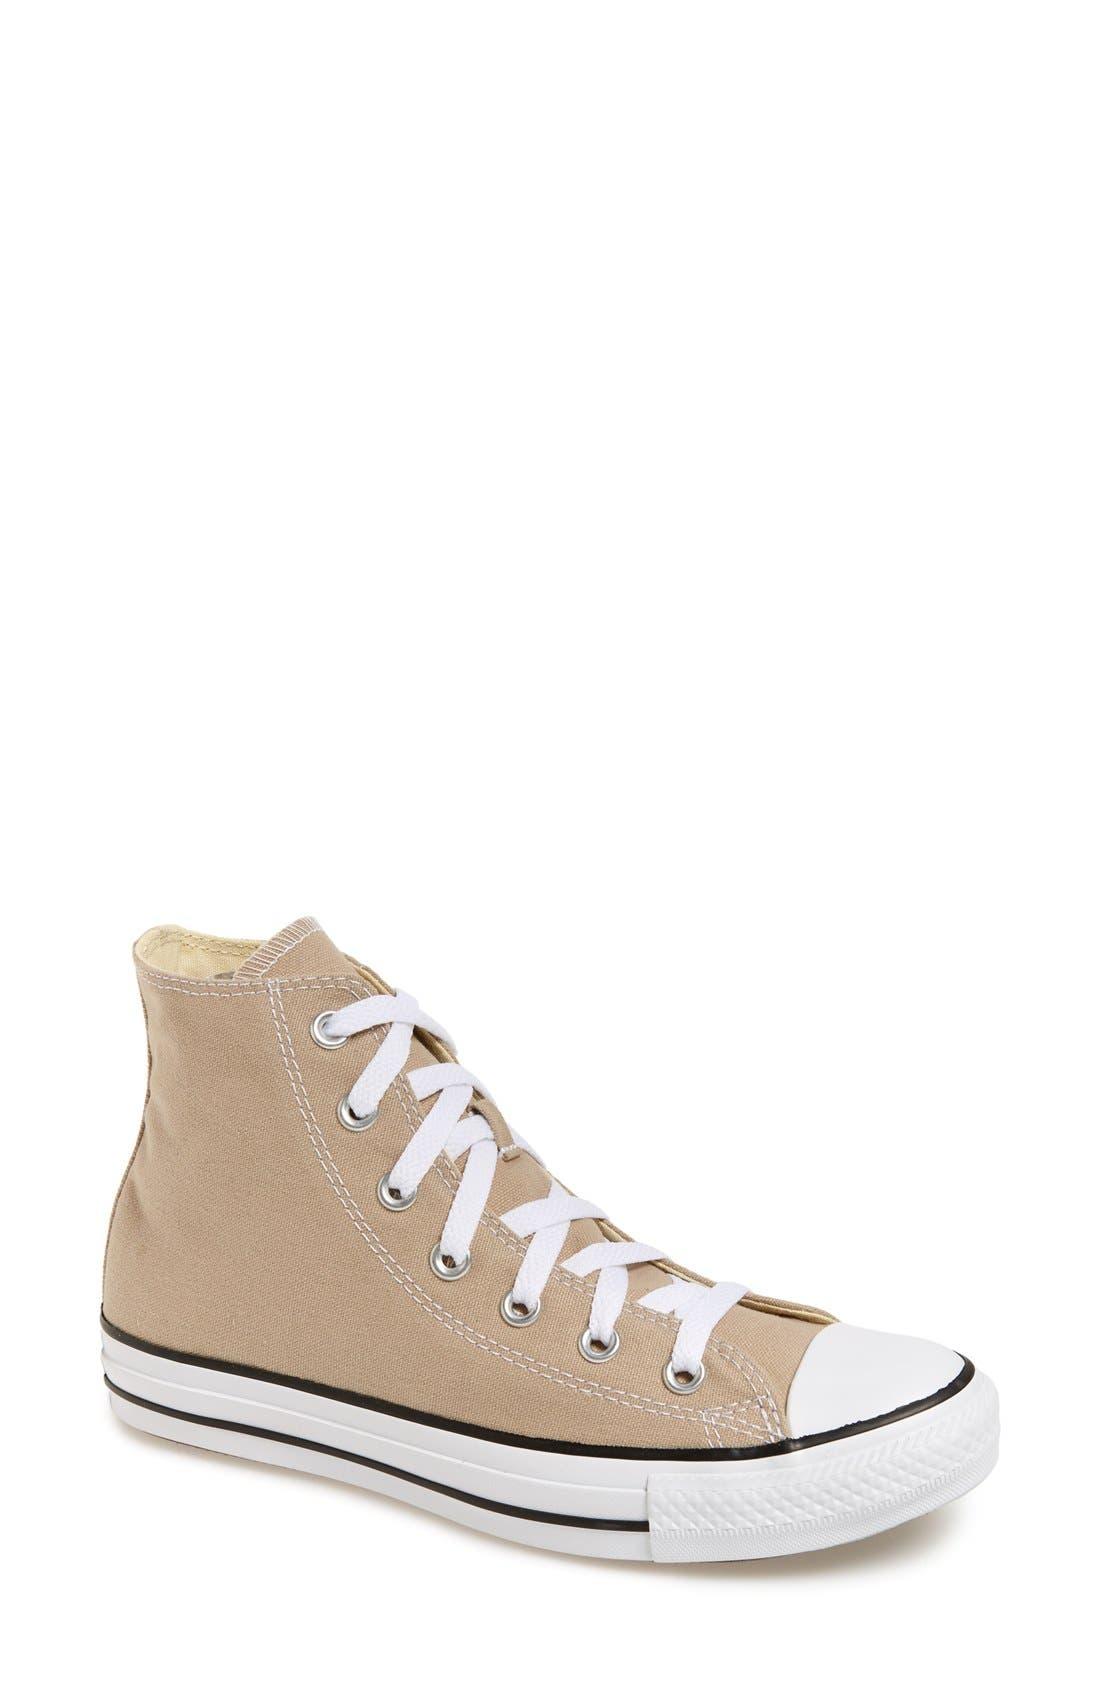 Alternate Image 1 Selected - Converse Chuck Taylor® All Star®' Seasonal' High Top Sneaker (Women)